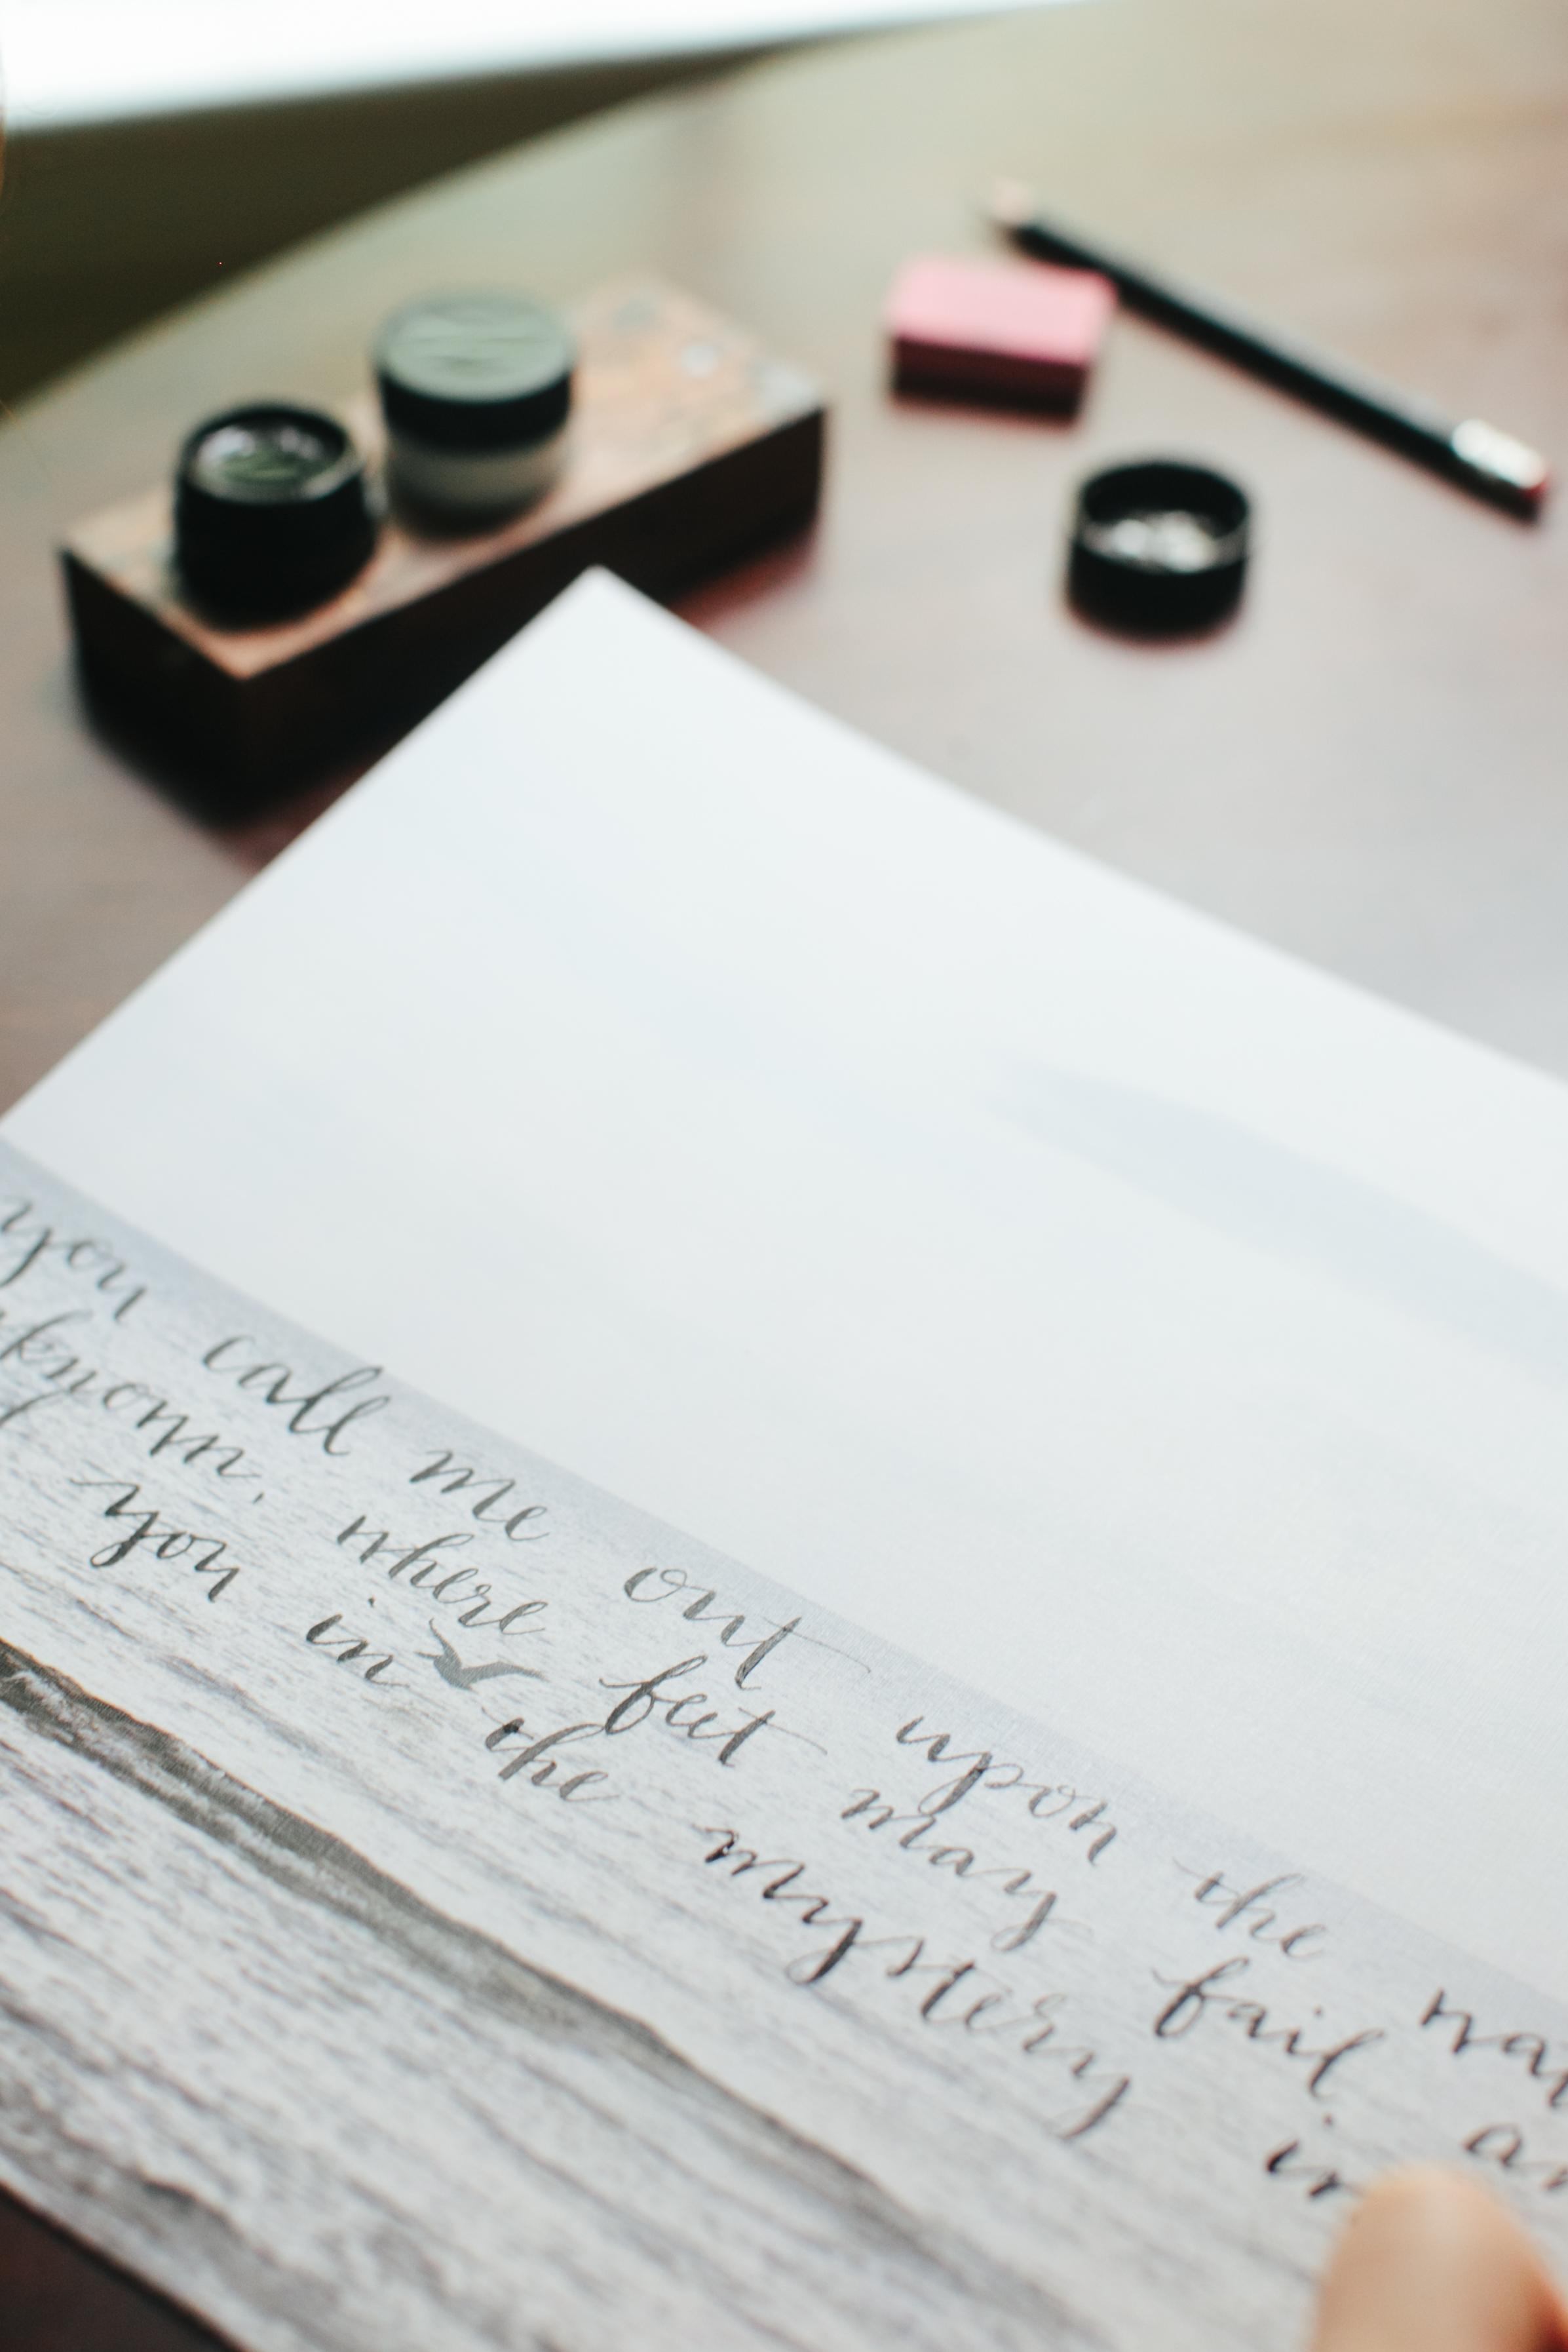 Kathryn-McCrary-Photography-Jenn-Gietzen-Write-On-Design-Market-Collab-17.jpg